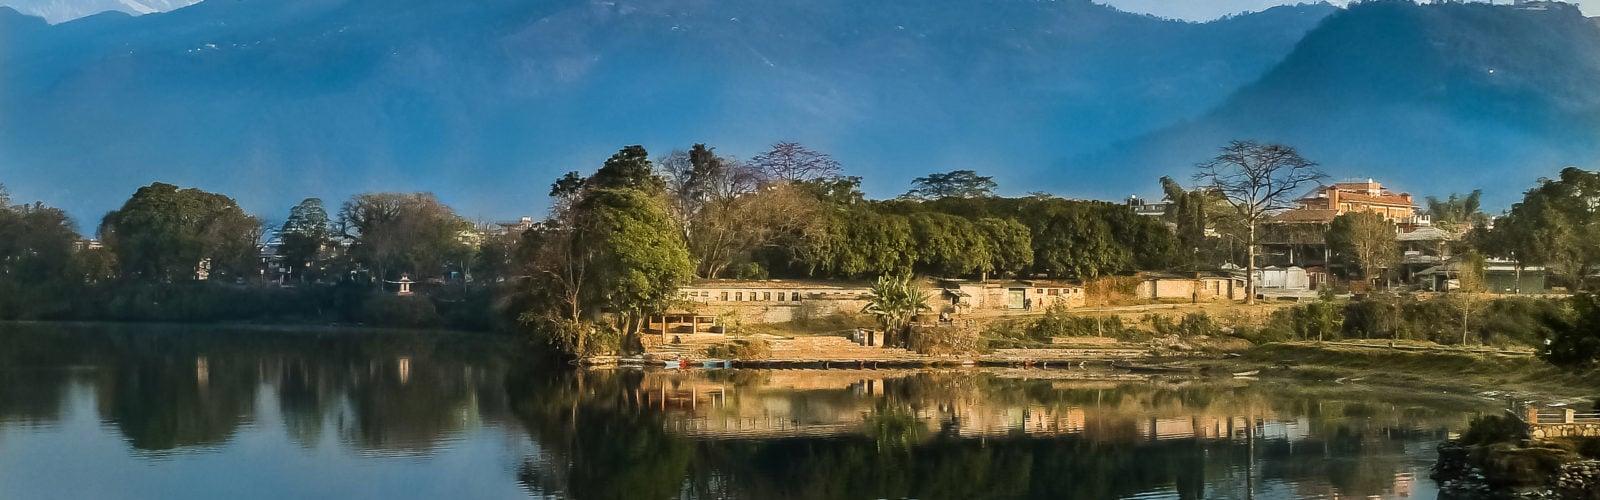 phewa-lake-pohkara